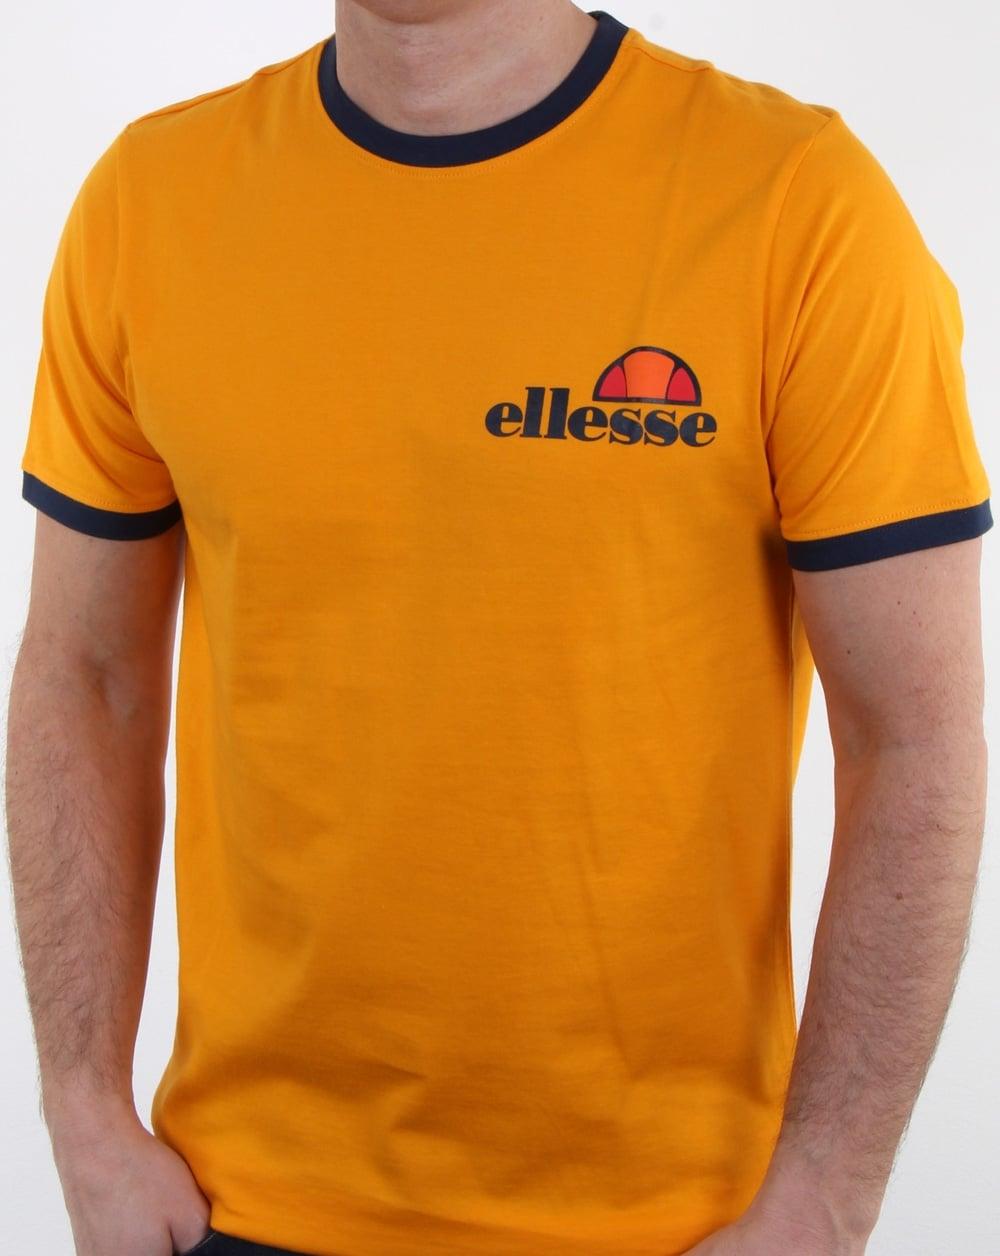 5a236b83d3 Ellesse Agrigento T Shirt Orange